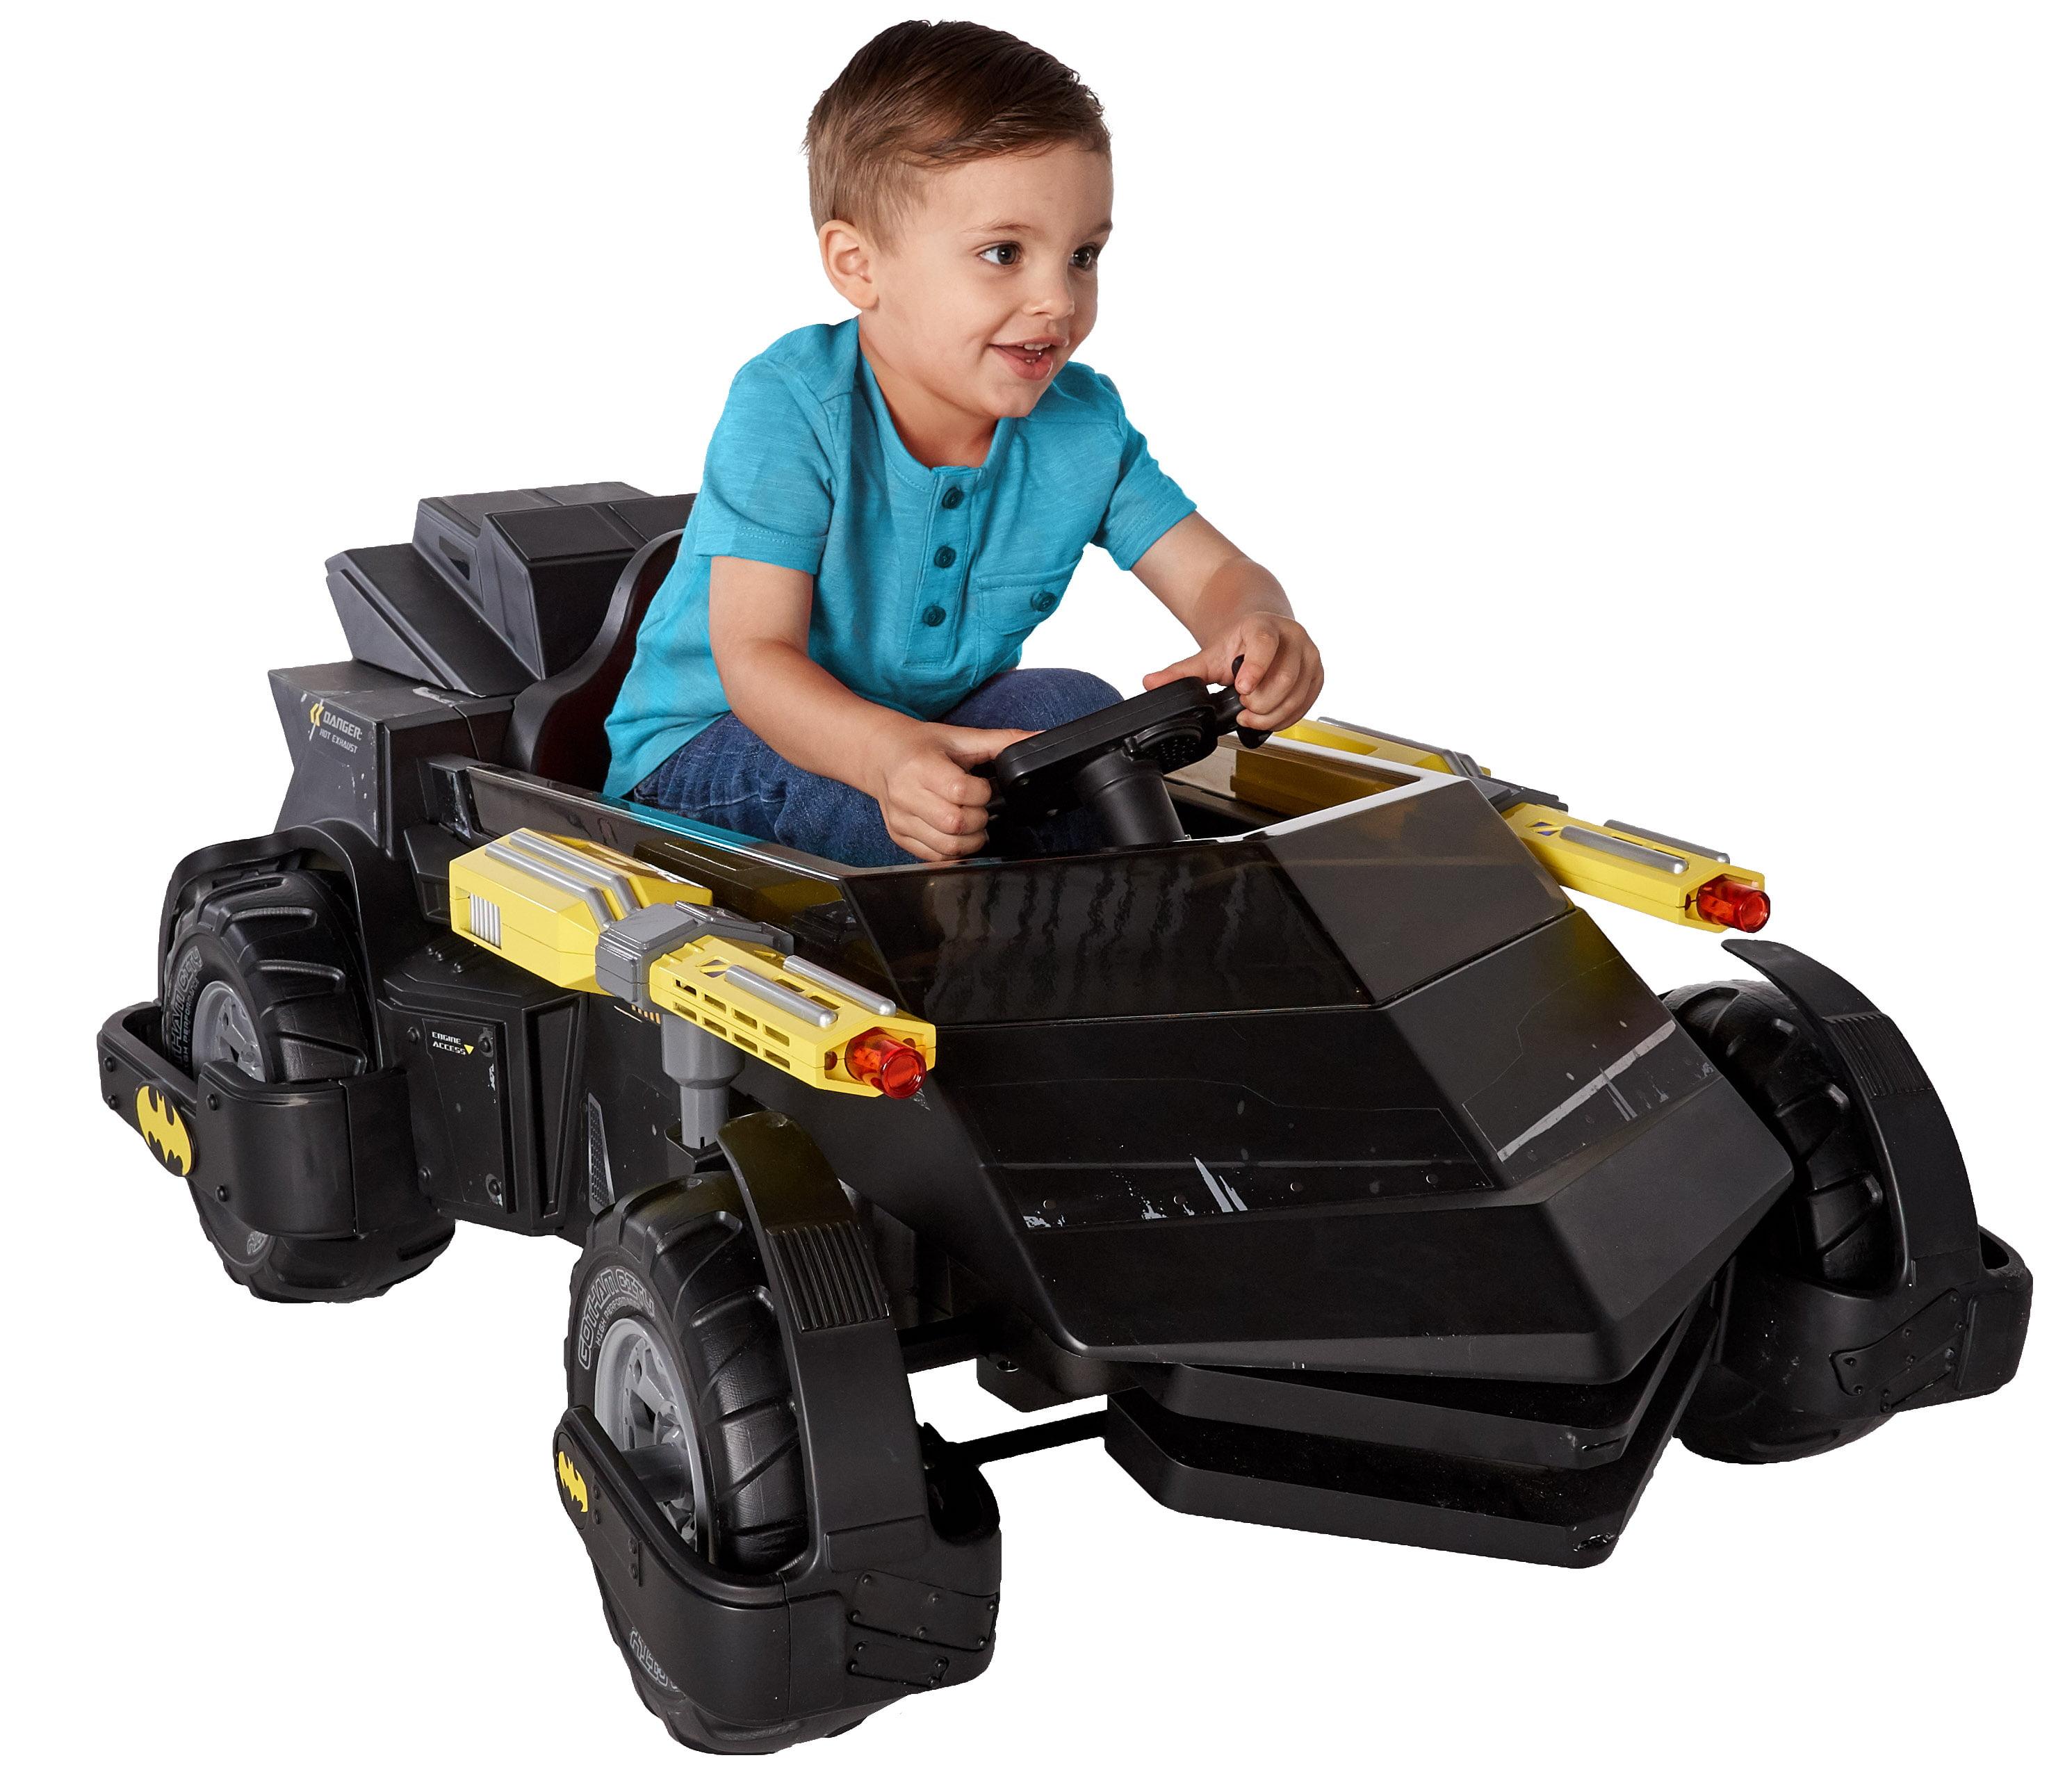 6 Volt DC Comics Batman Batmobile Battery Powered Rideon - Features Light up Cannons and Sounds! - Walmart.com